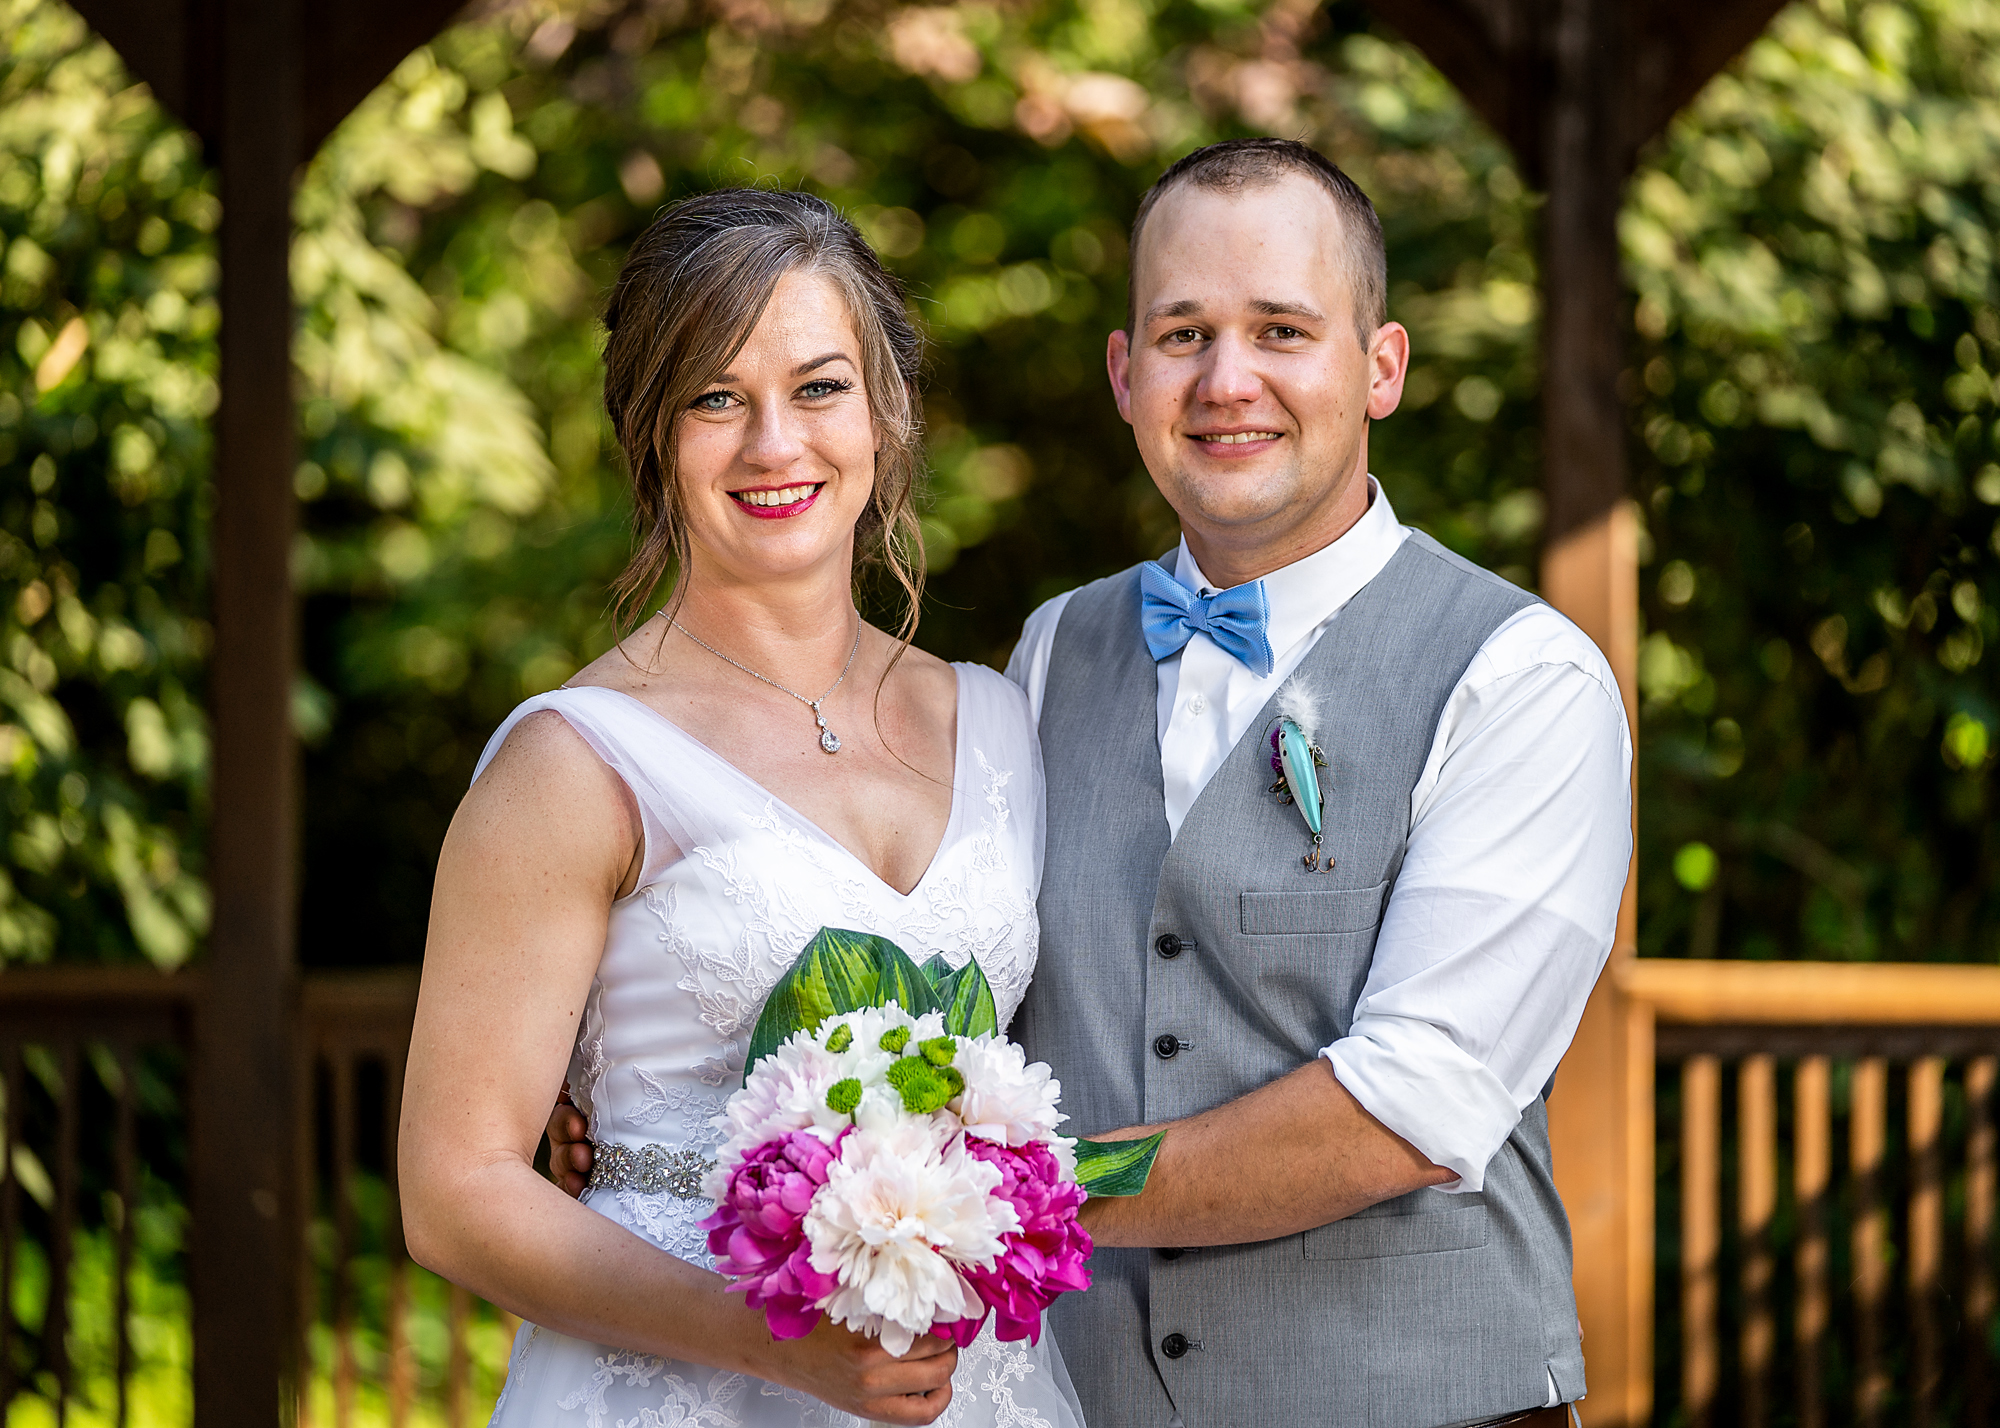 Pattison-Park-Lodge-Wedding-Cincinnati-Ohio-Photographer-4.jpg